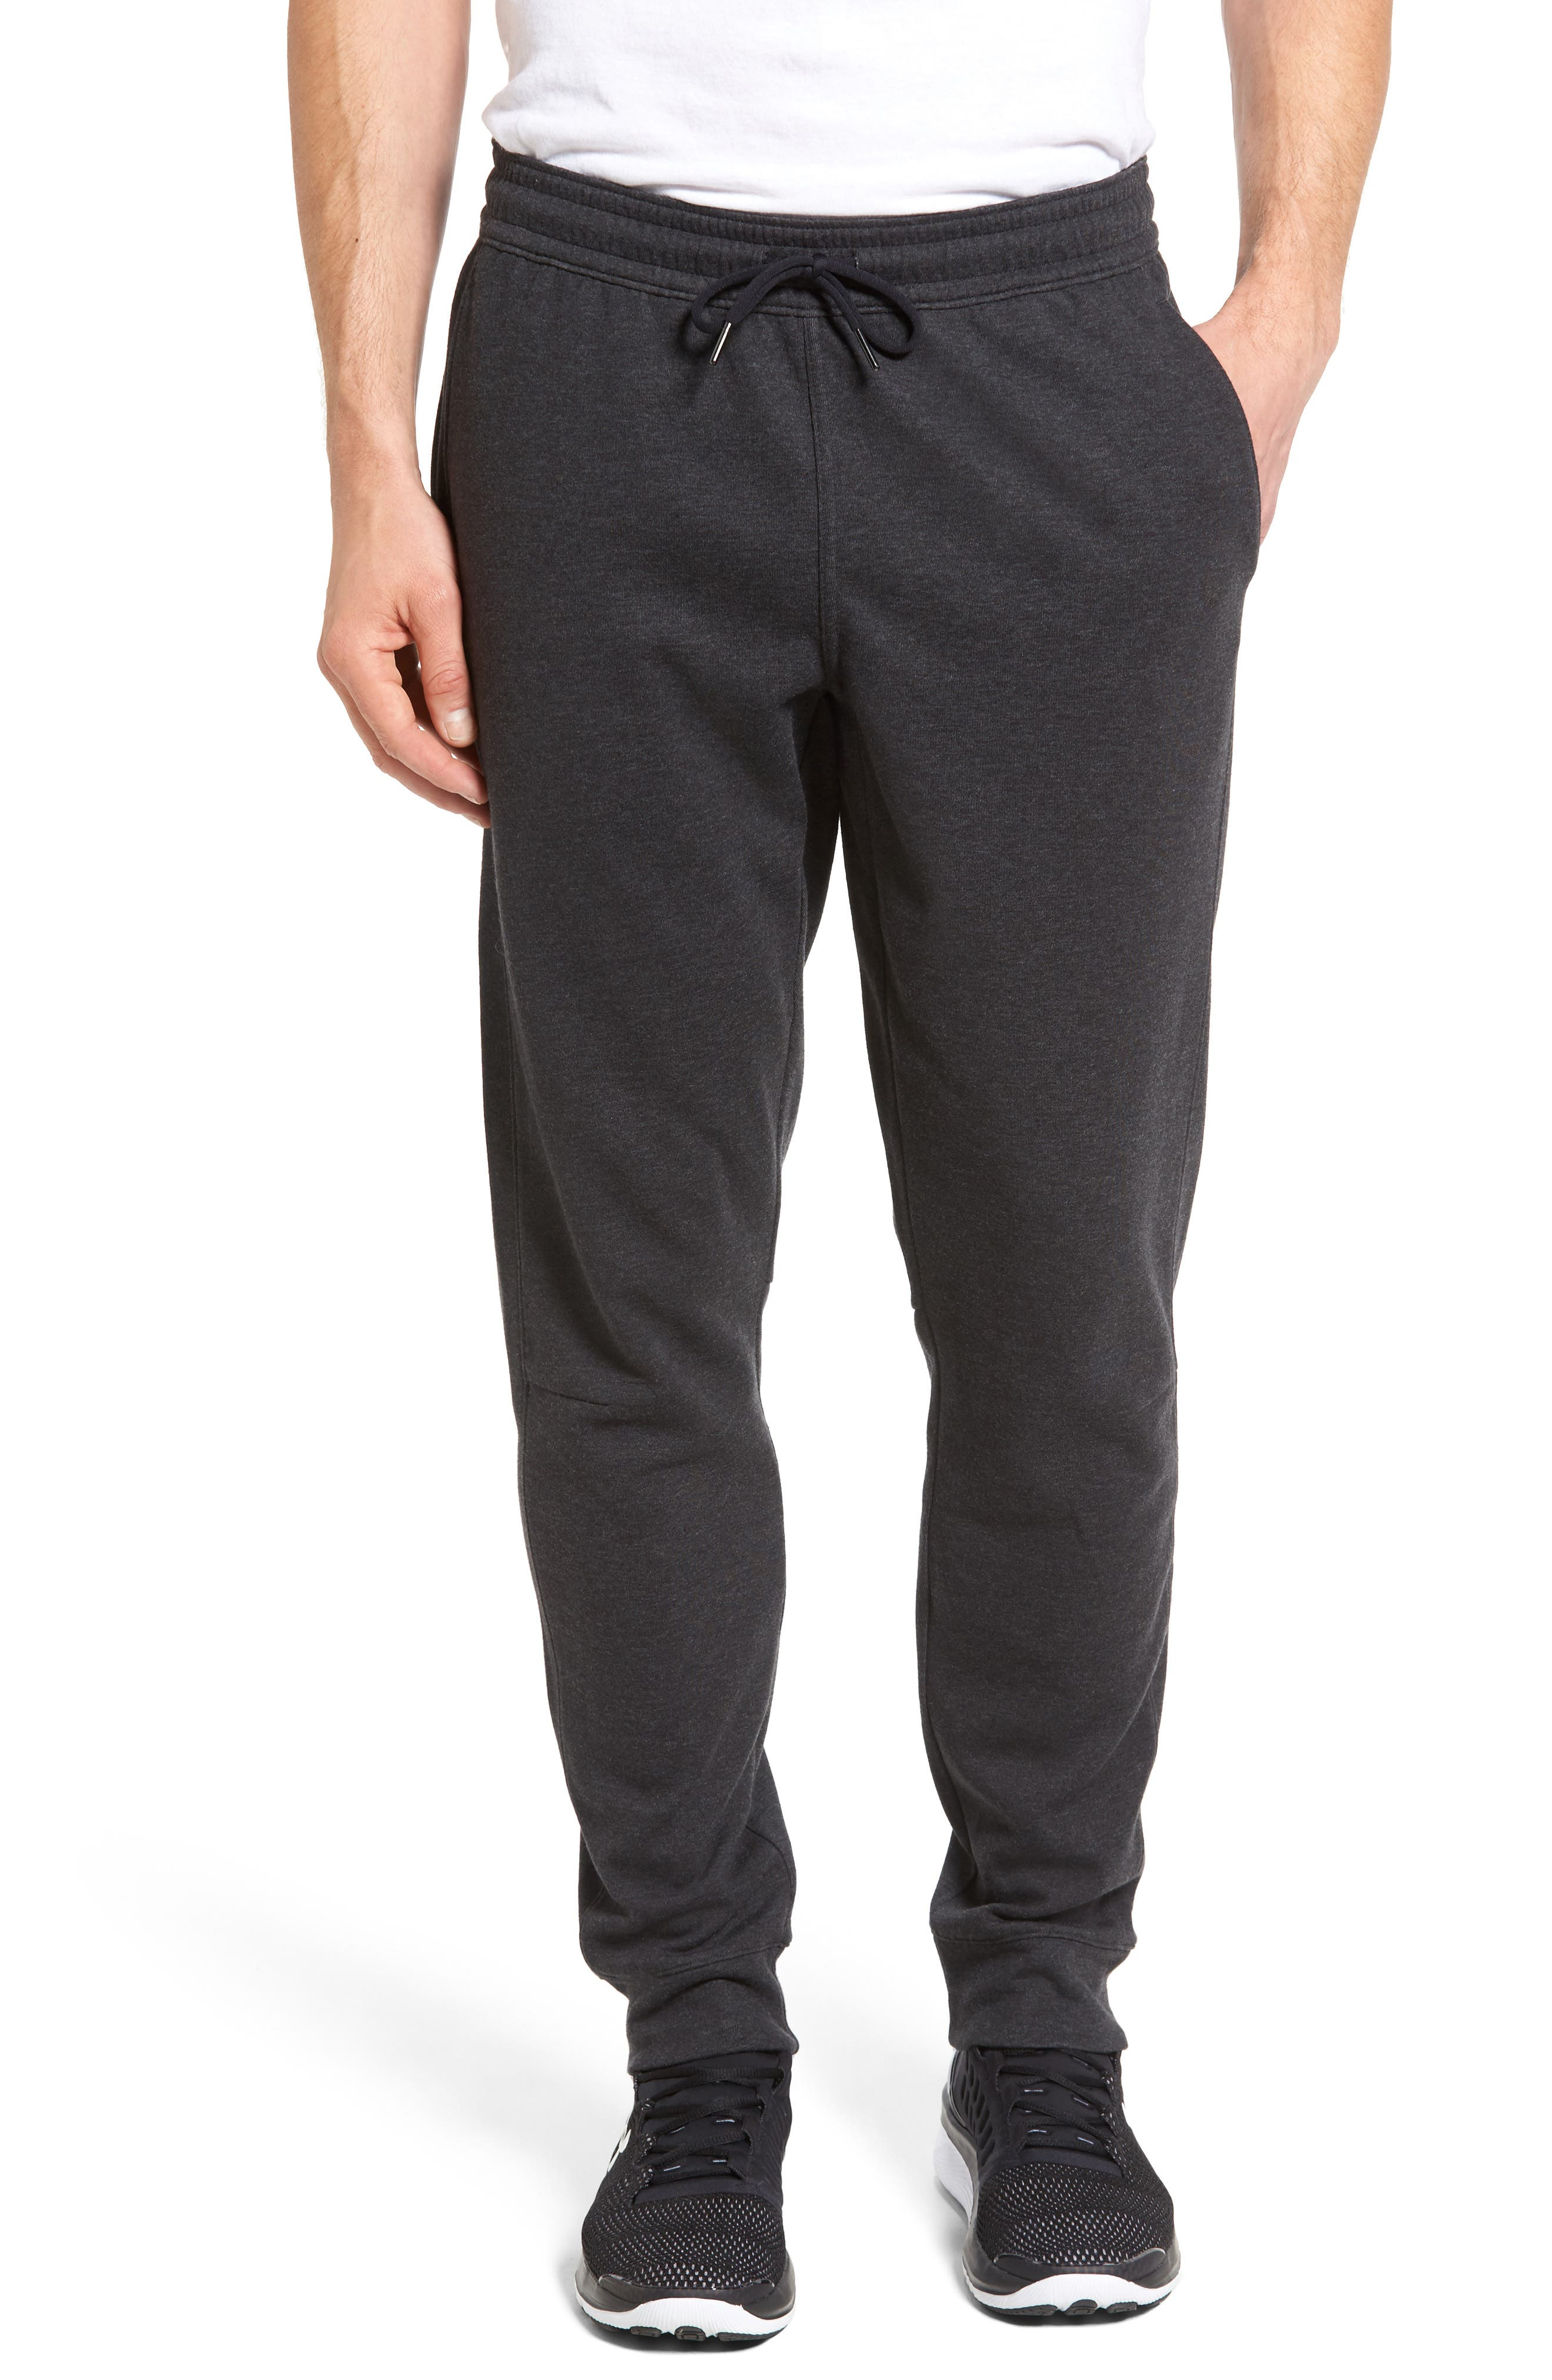 Zella Knit Jogger Pants